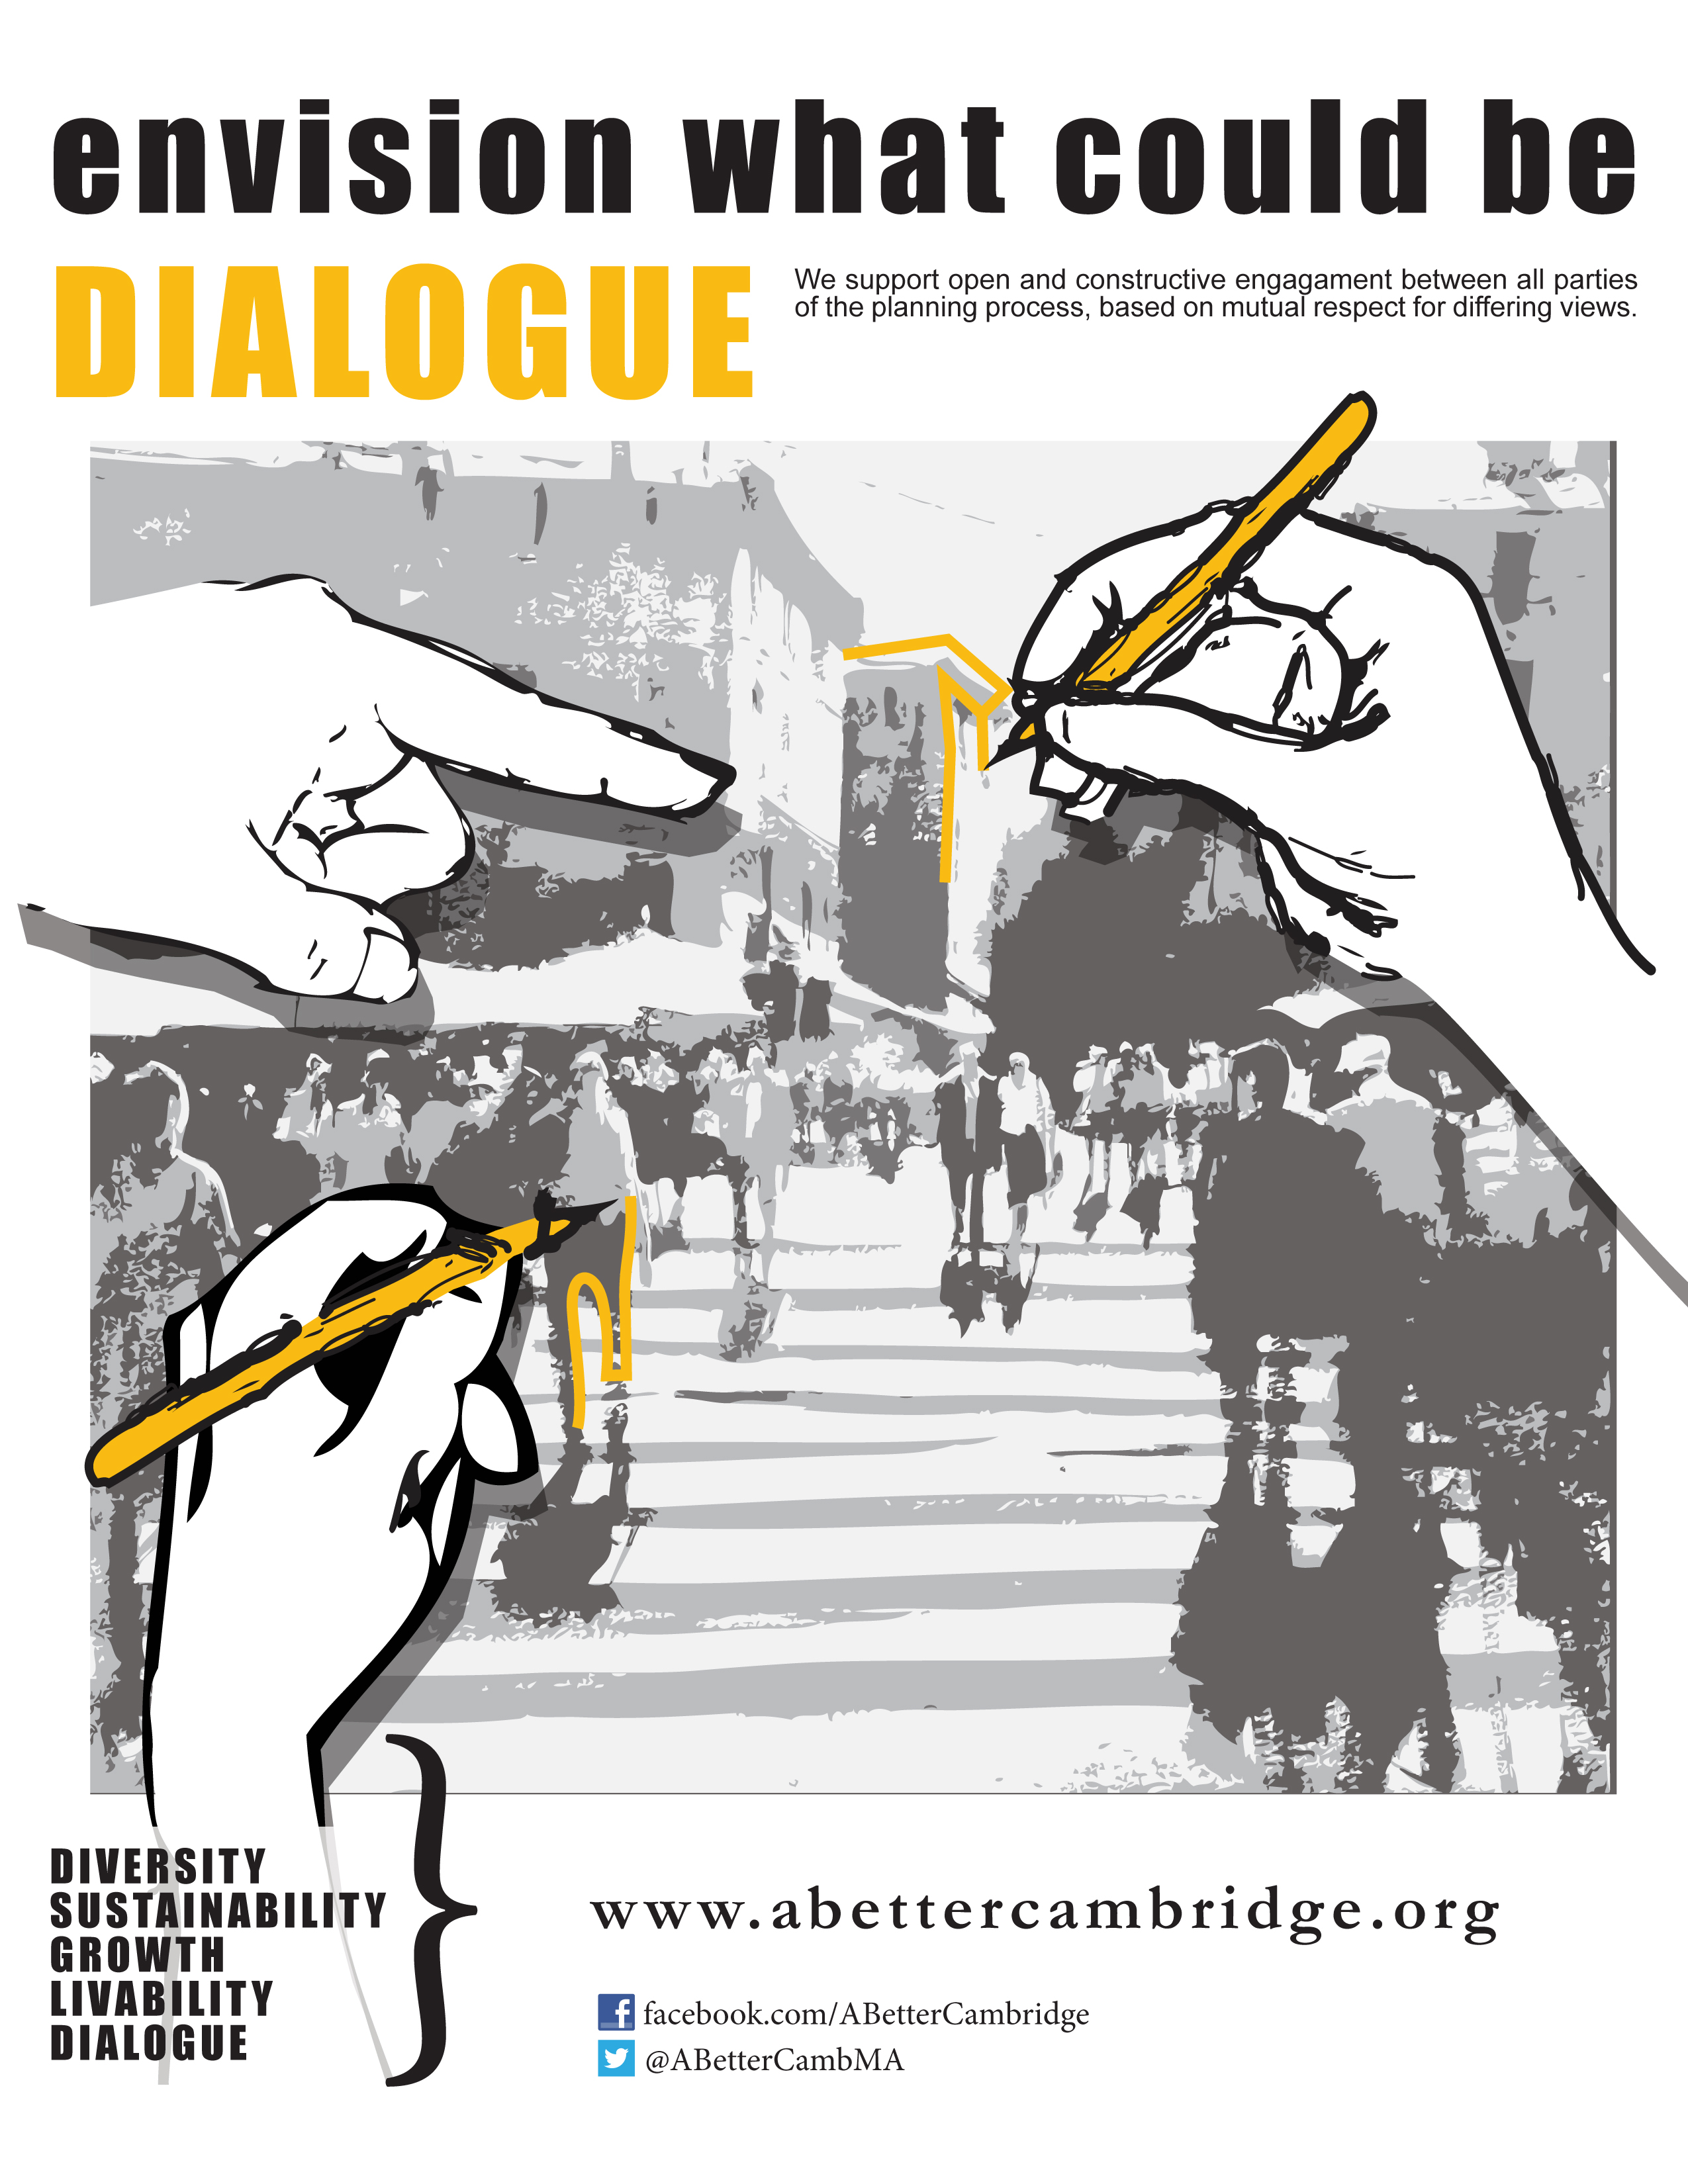 ABC_principles_posters-dialogue.jpg